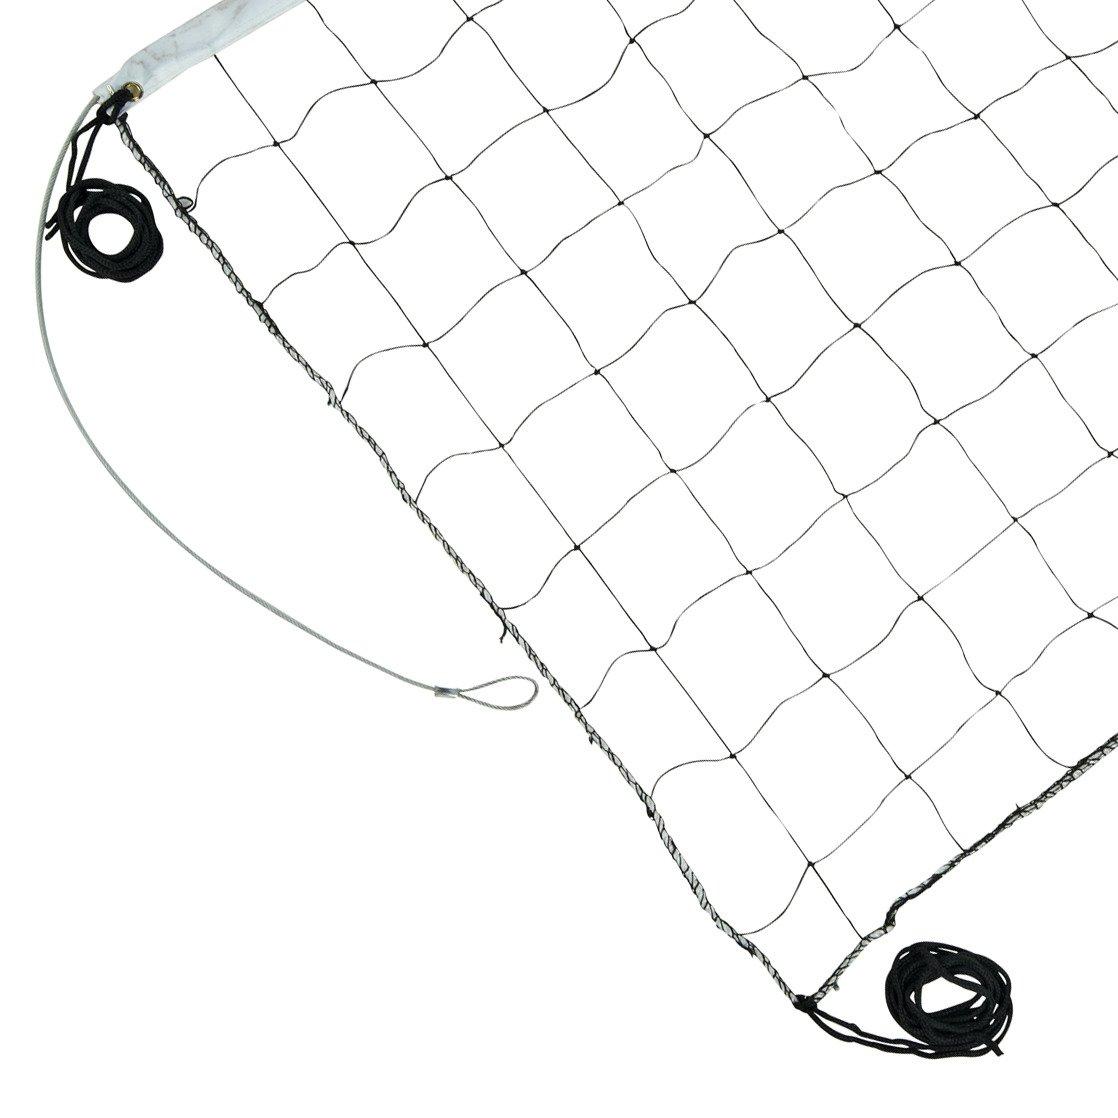 Volleyball Nets & Court Equipment